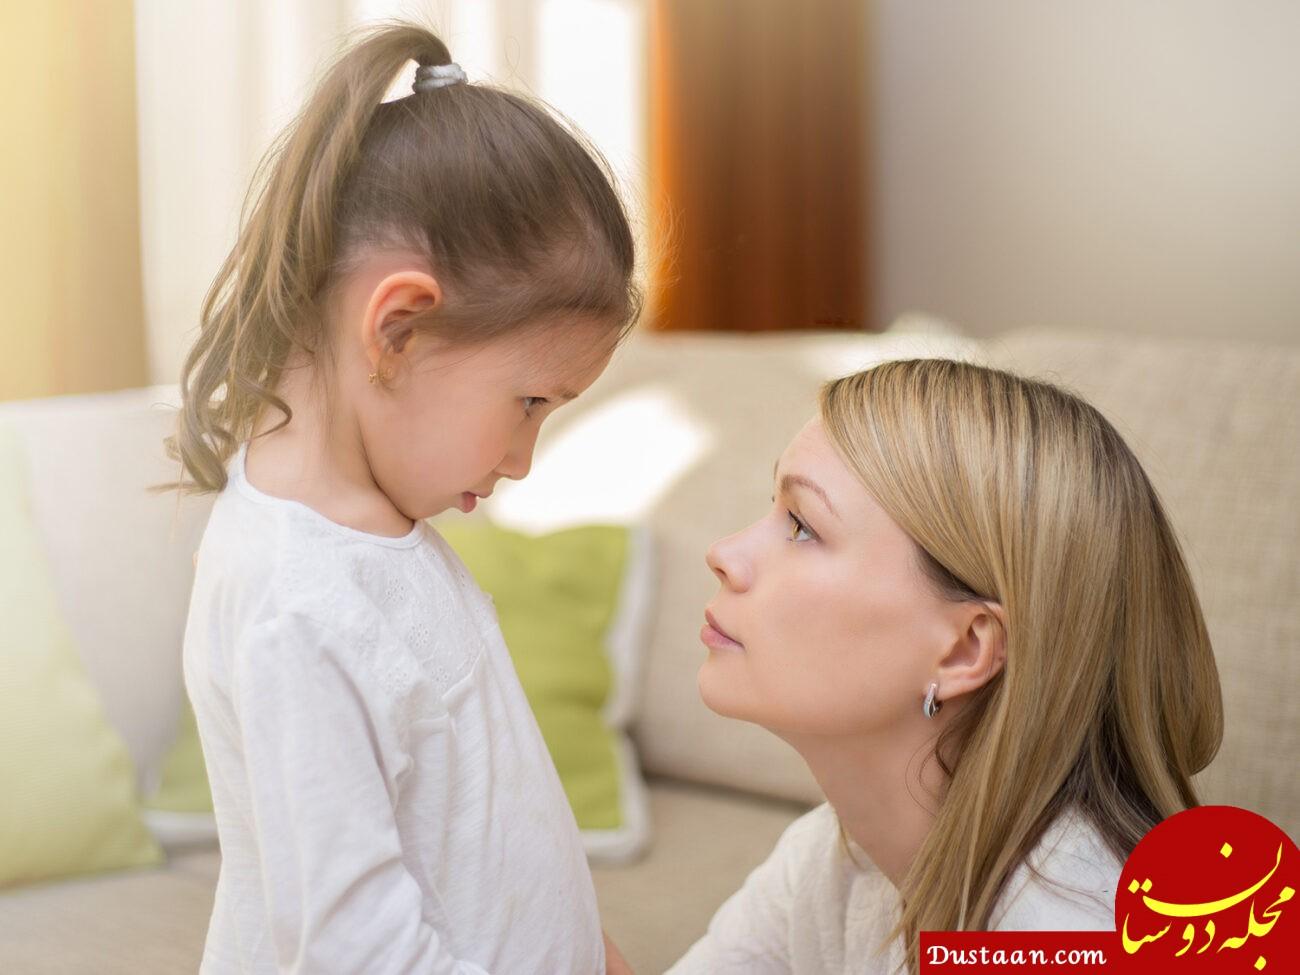 چگونه به کودک نه بگوییم؟!